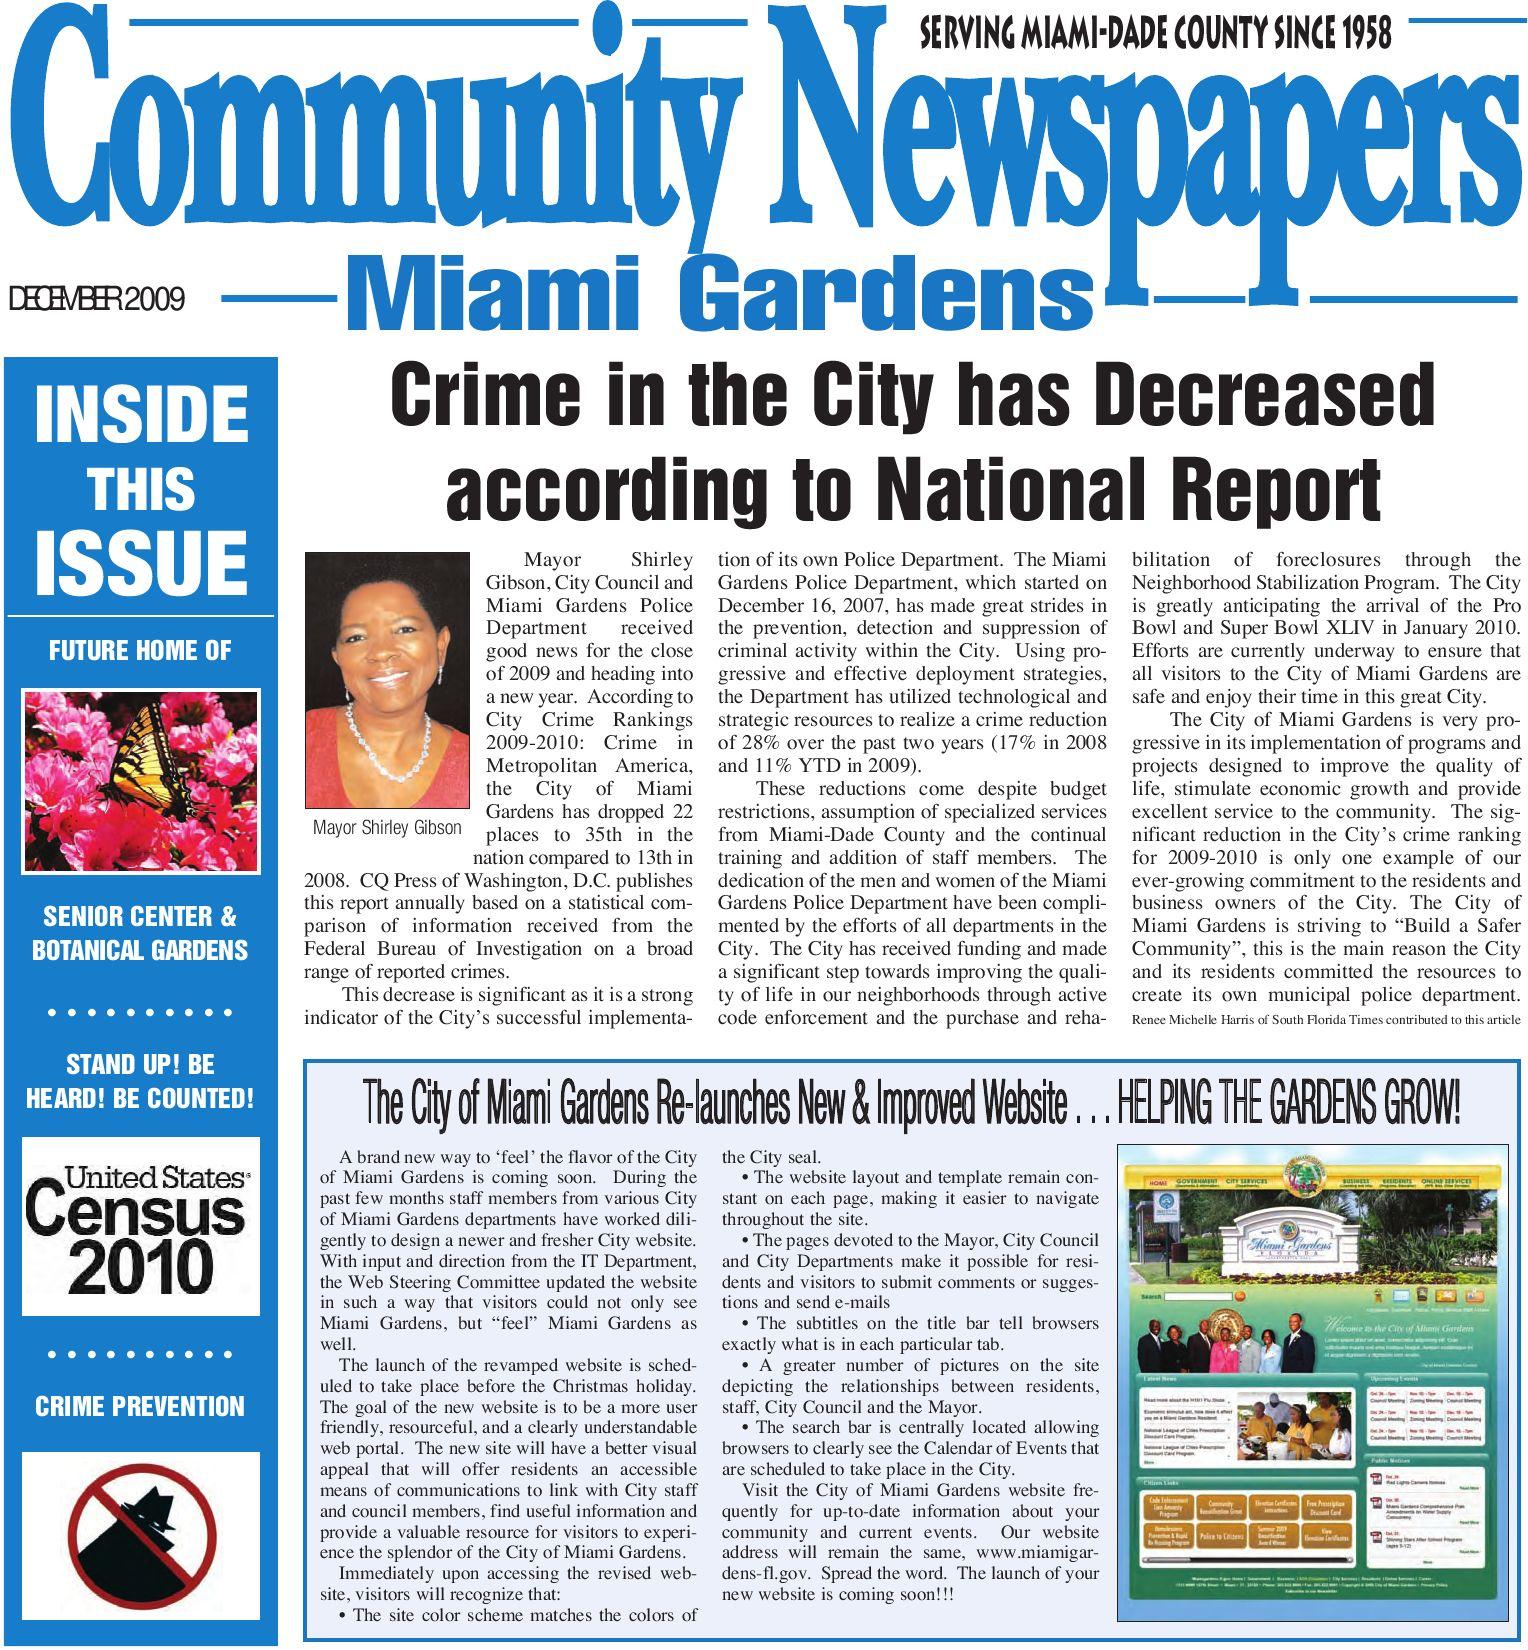 Miami Gardens, December 2009, Legal Edition - local news